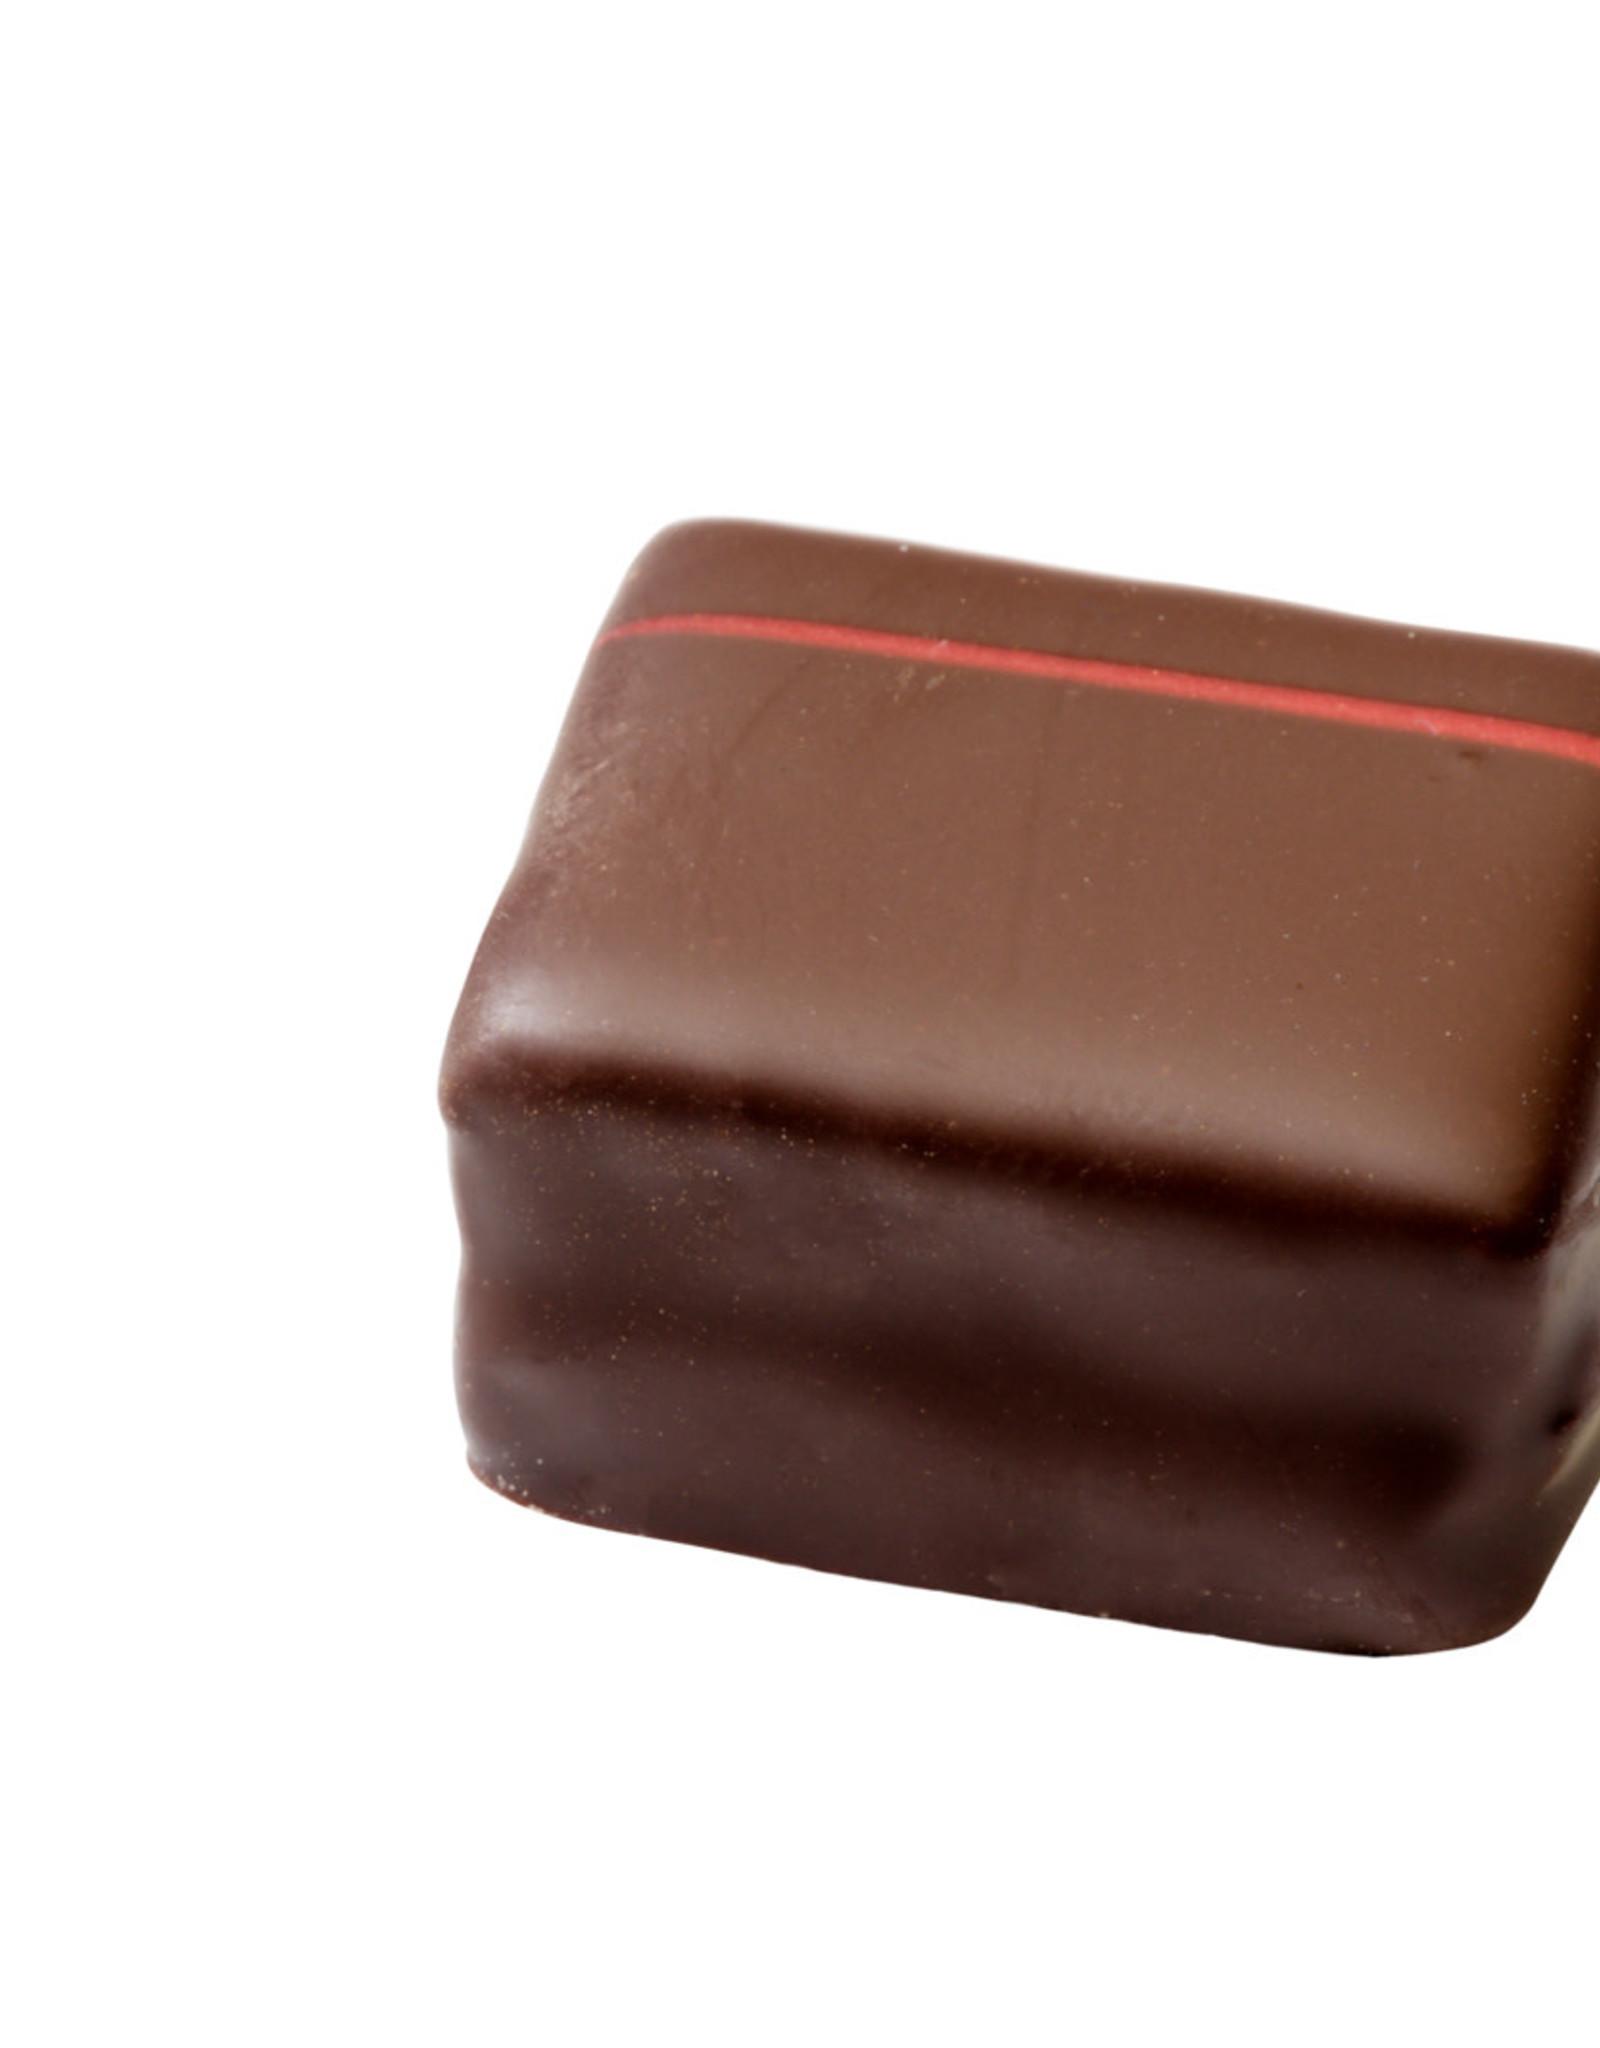 Visser Chocolade Bosaardbei Peper